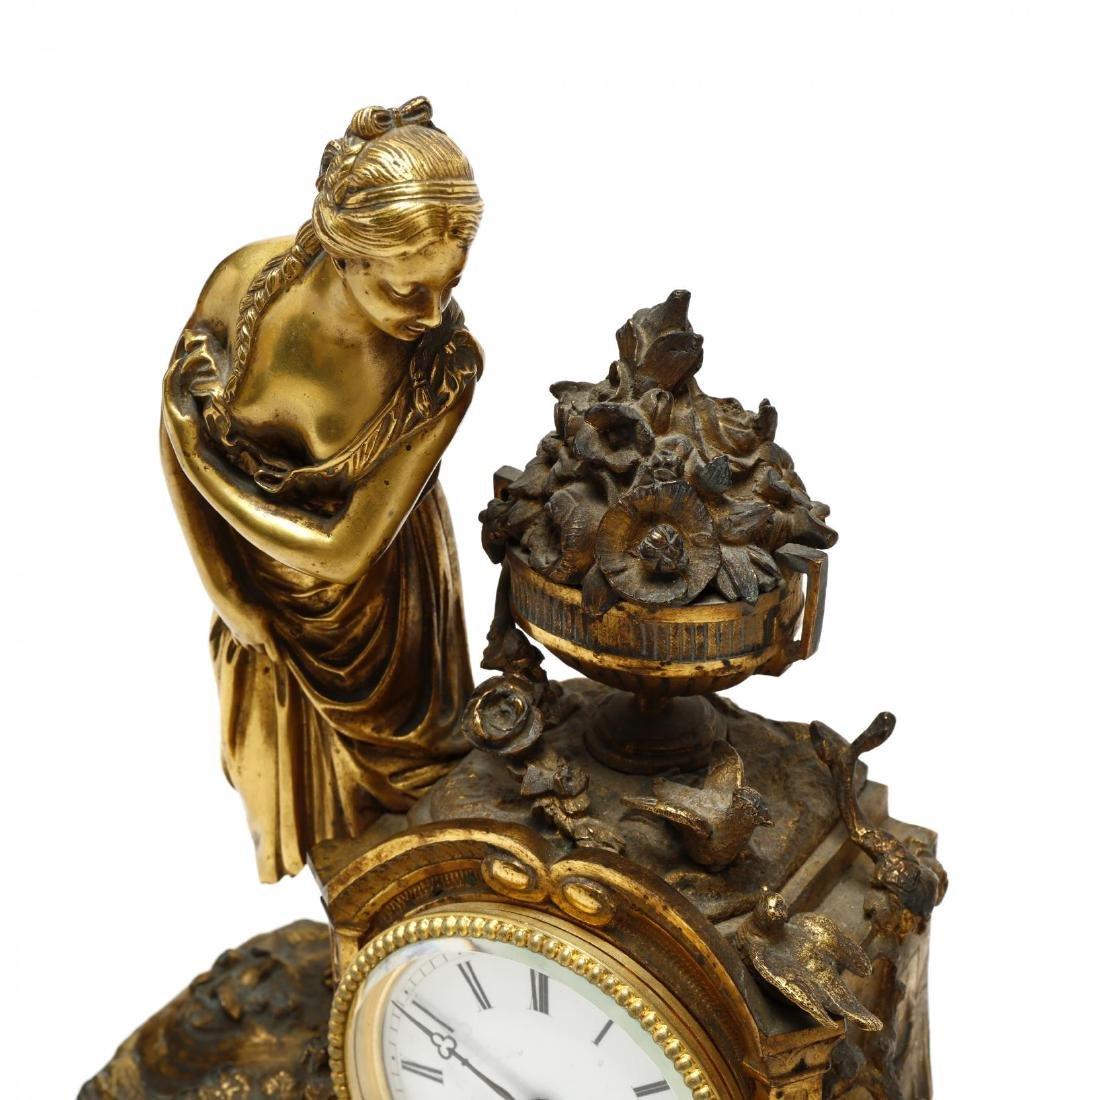 Antique French Gilt Bronze Figural Mantel Clock - 2